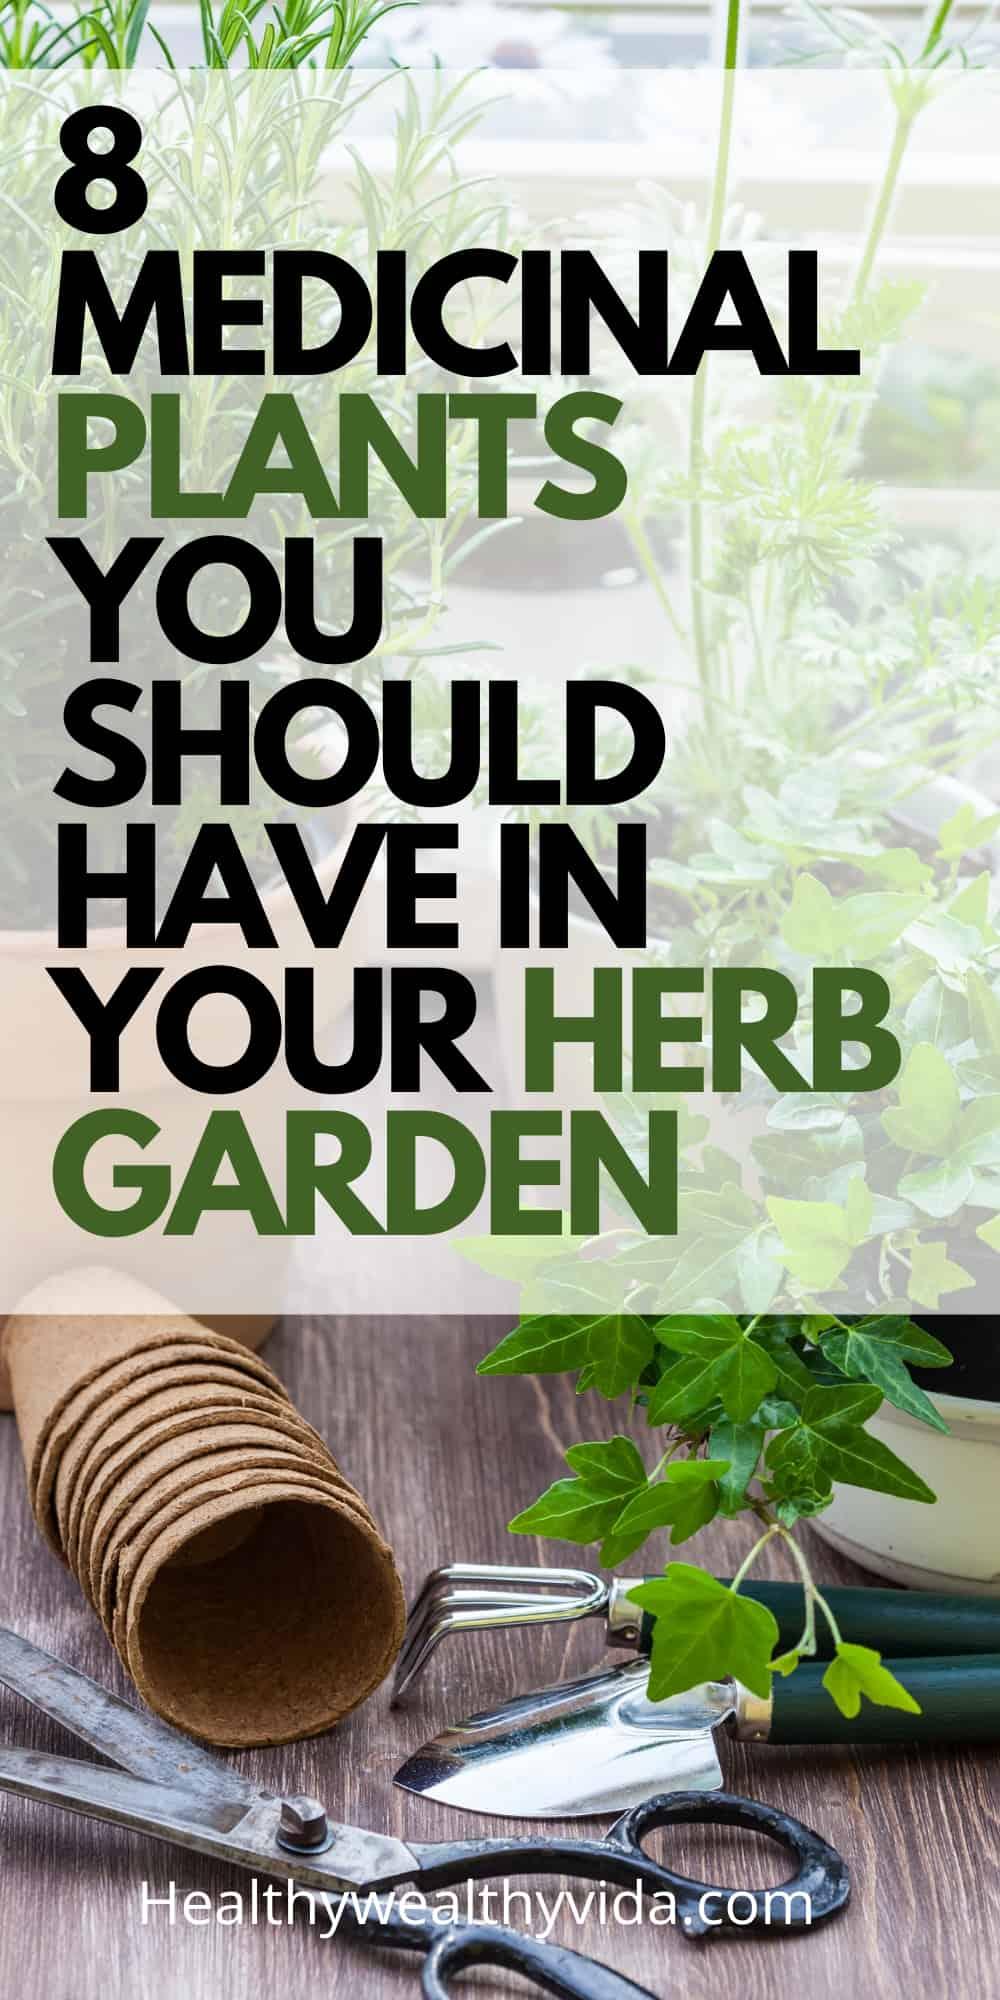 Medicinal Plants For Herb Garden